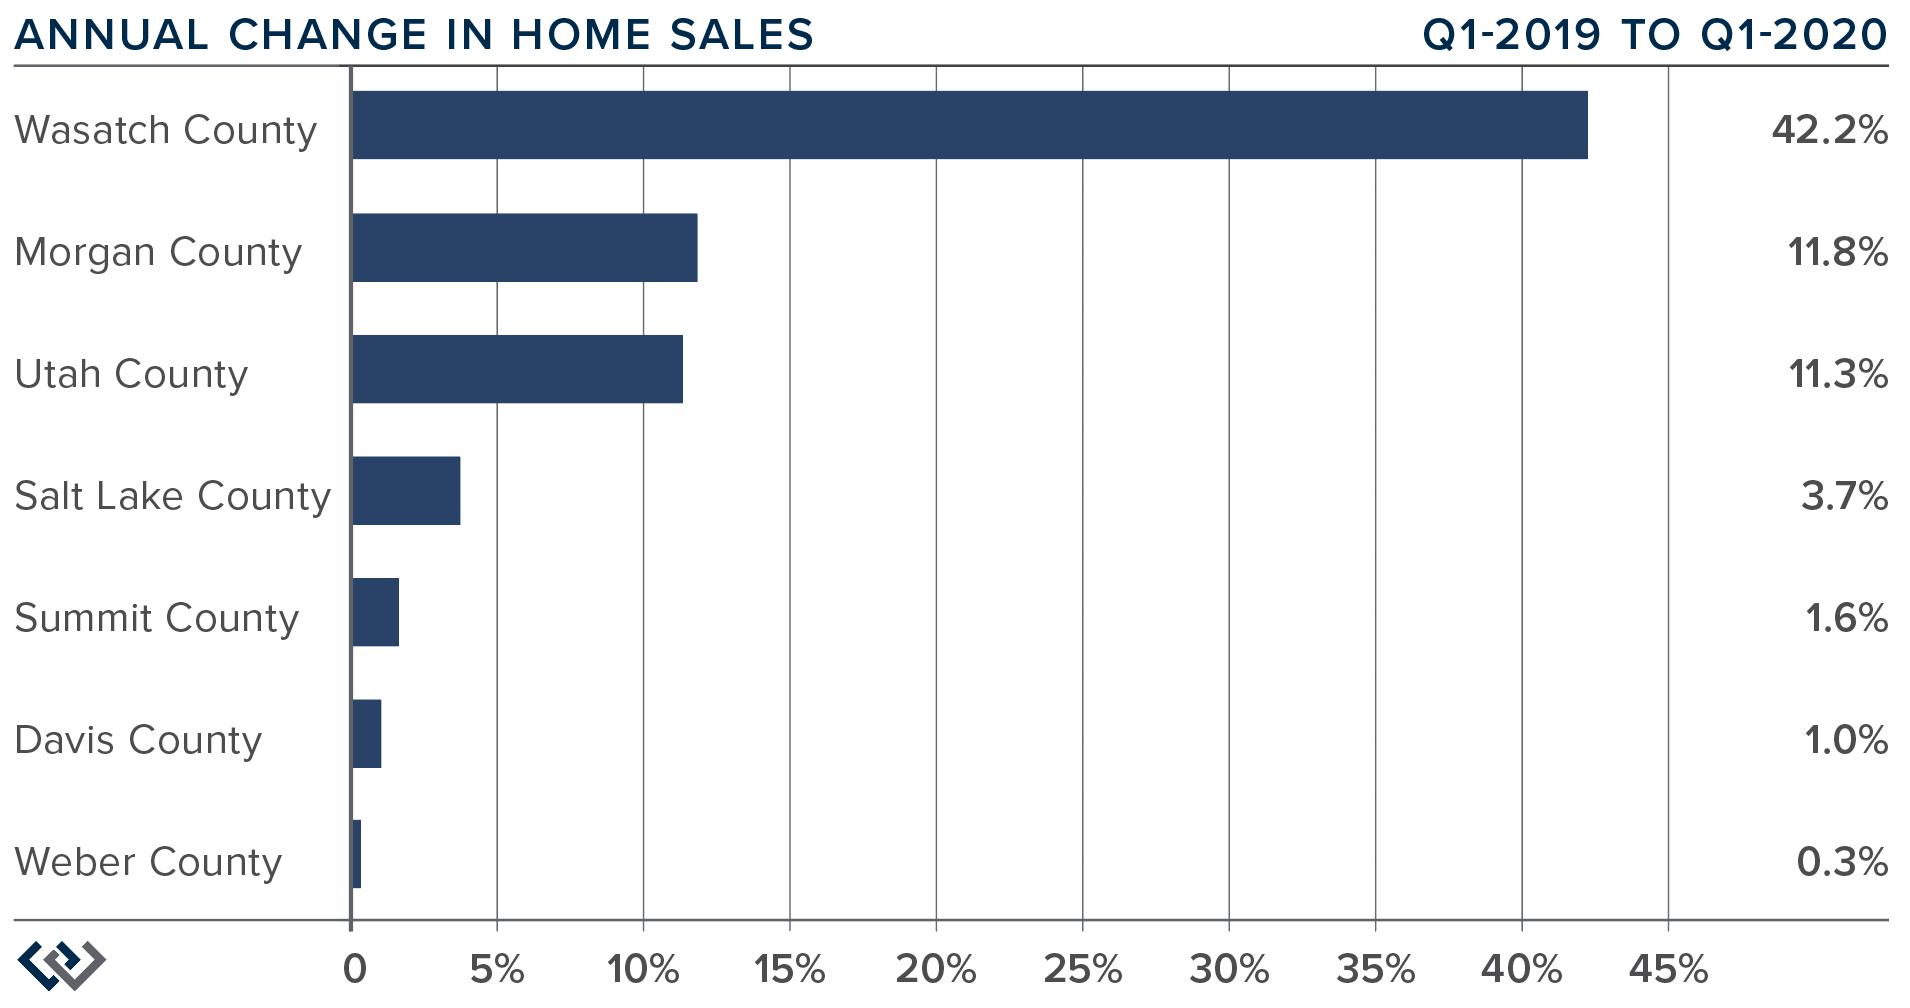 Windermere-Gardner-Report-Utah-Market-Trends-Annual-Change-Home-Sales-Quarter-1-2020